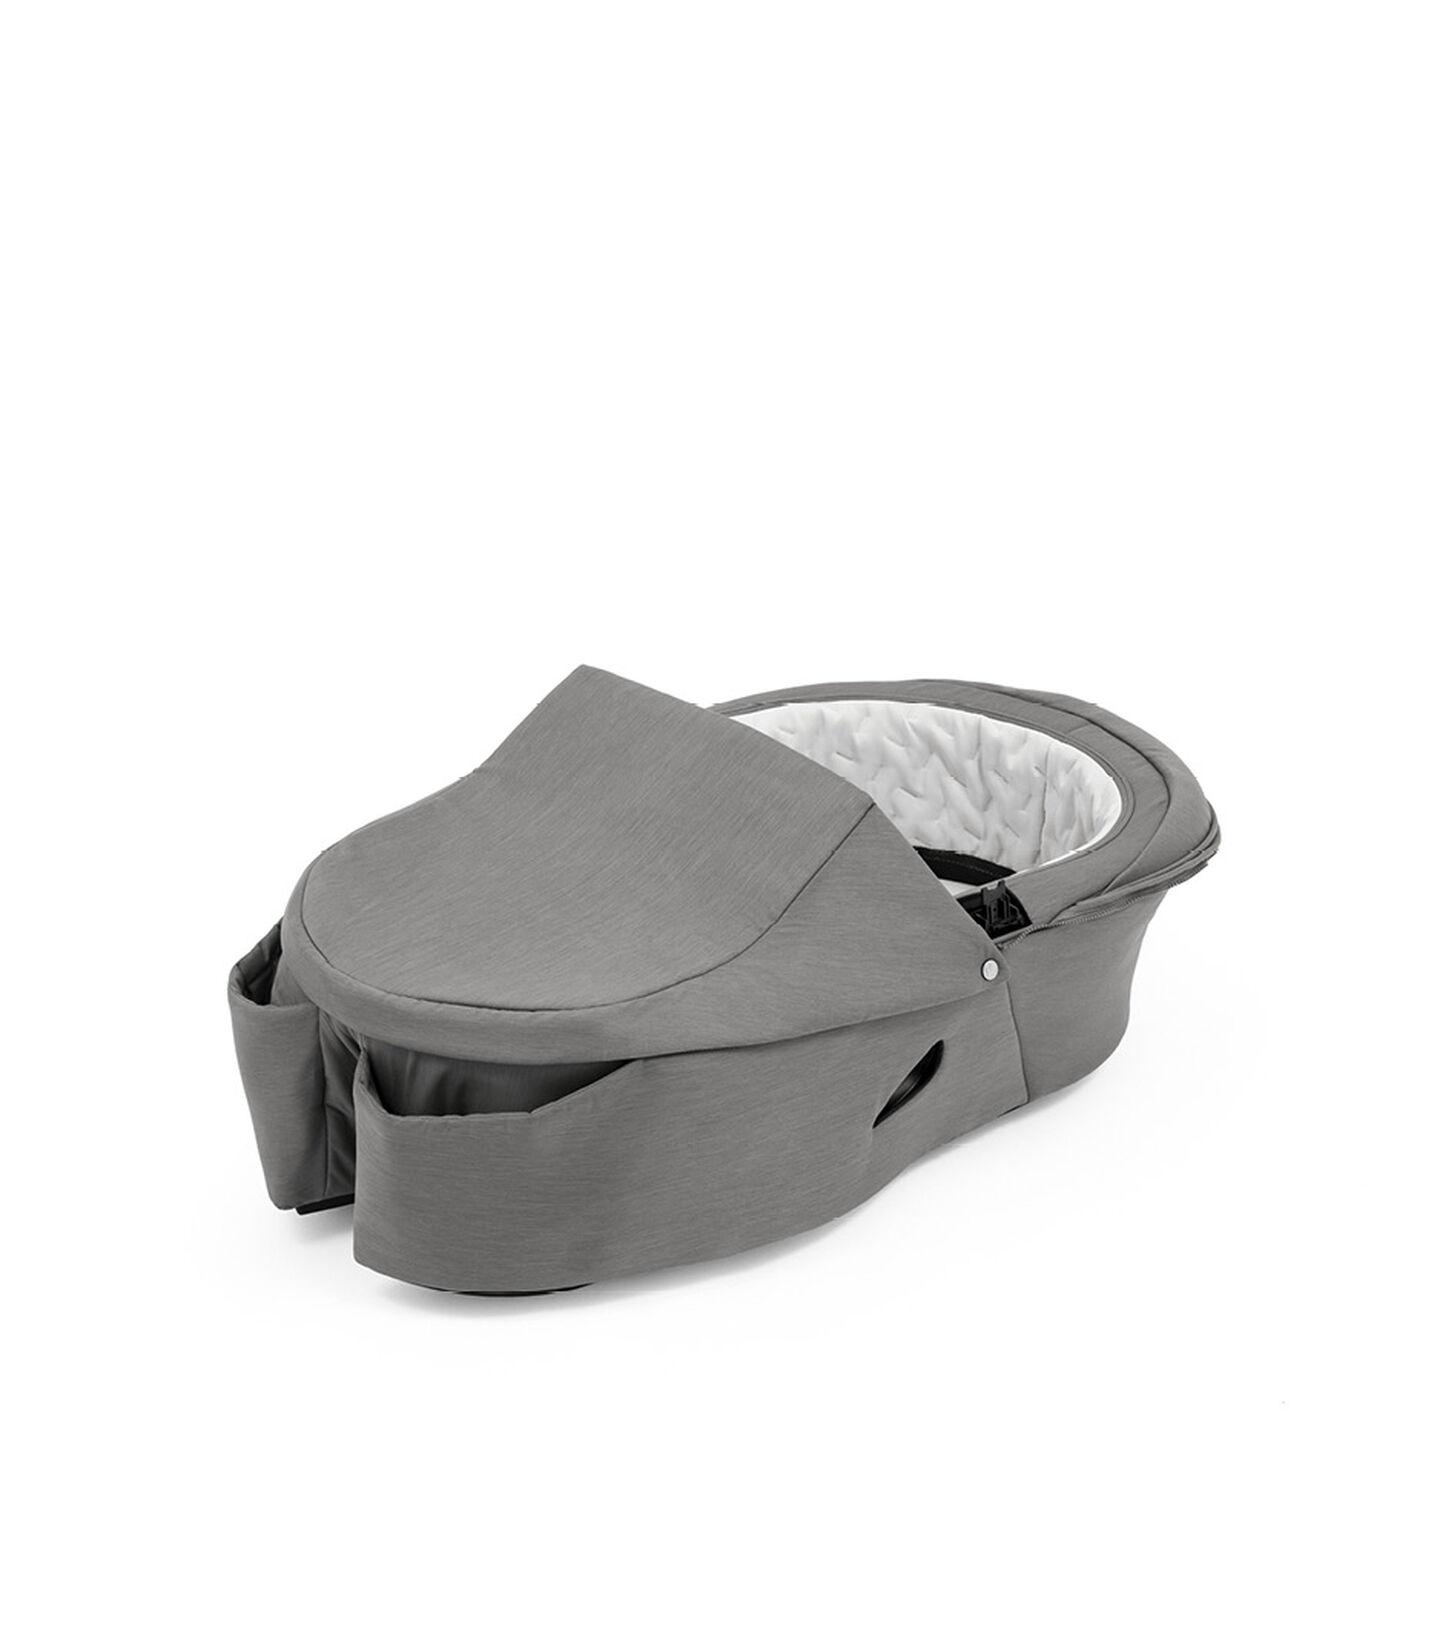 Stokke® Xplory® X Carry Cot Modern Grey, Modern Grey, mainview view 1